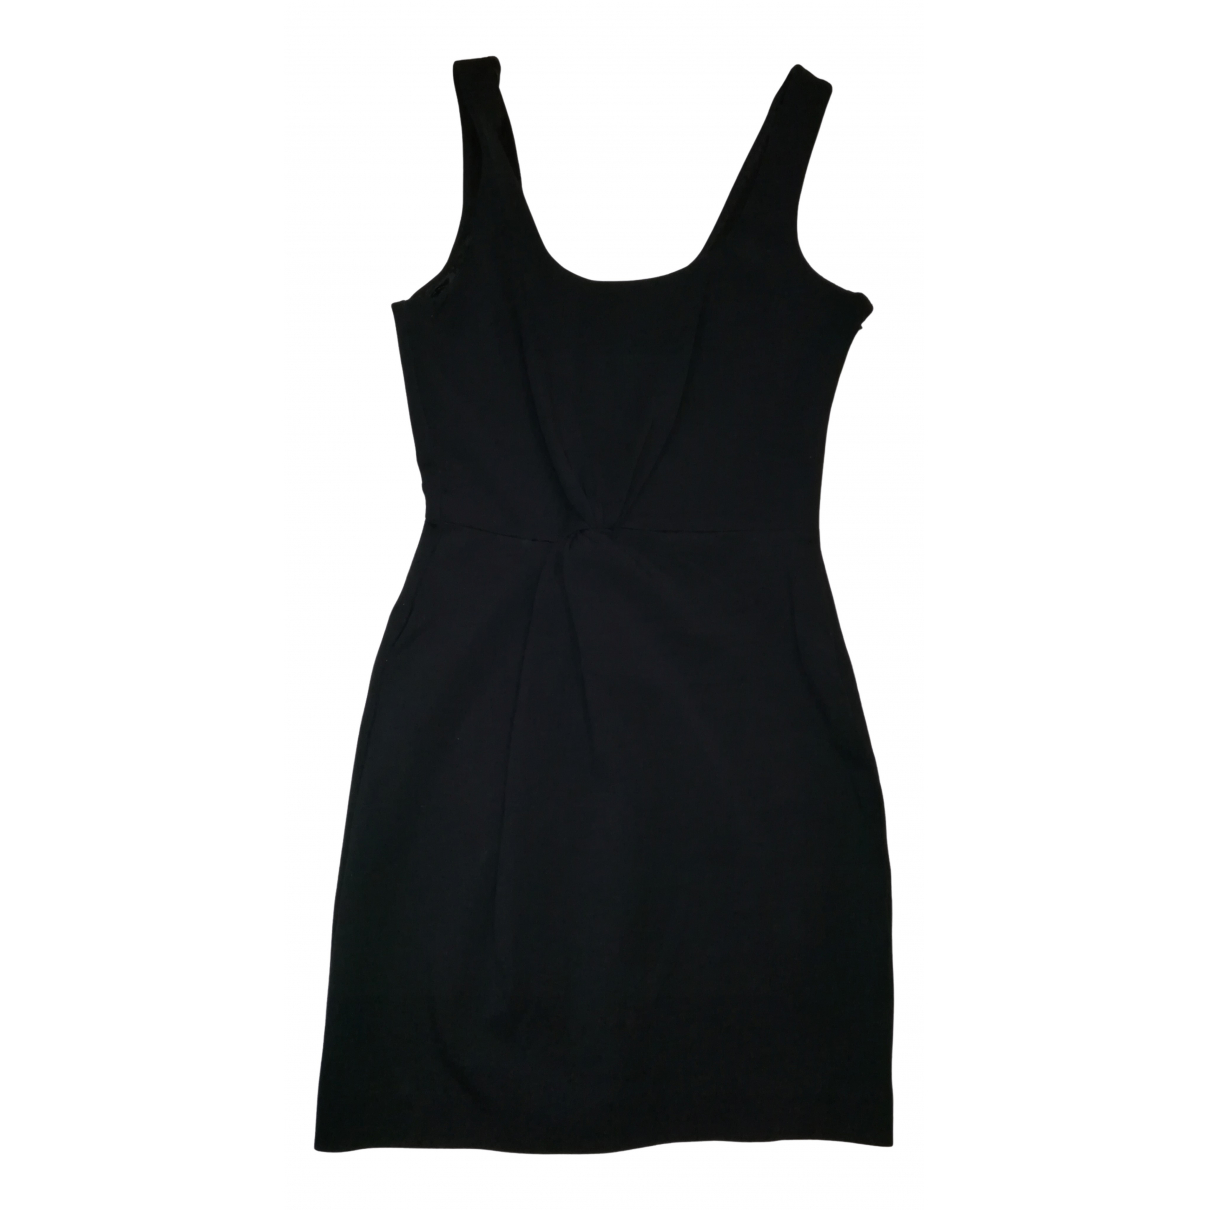 Emporio Armani \N Kleid in  Schwarz Synthetik